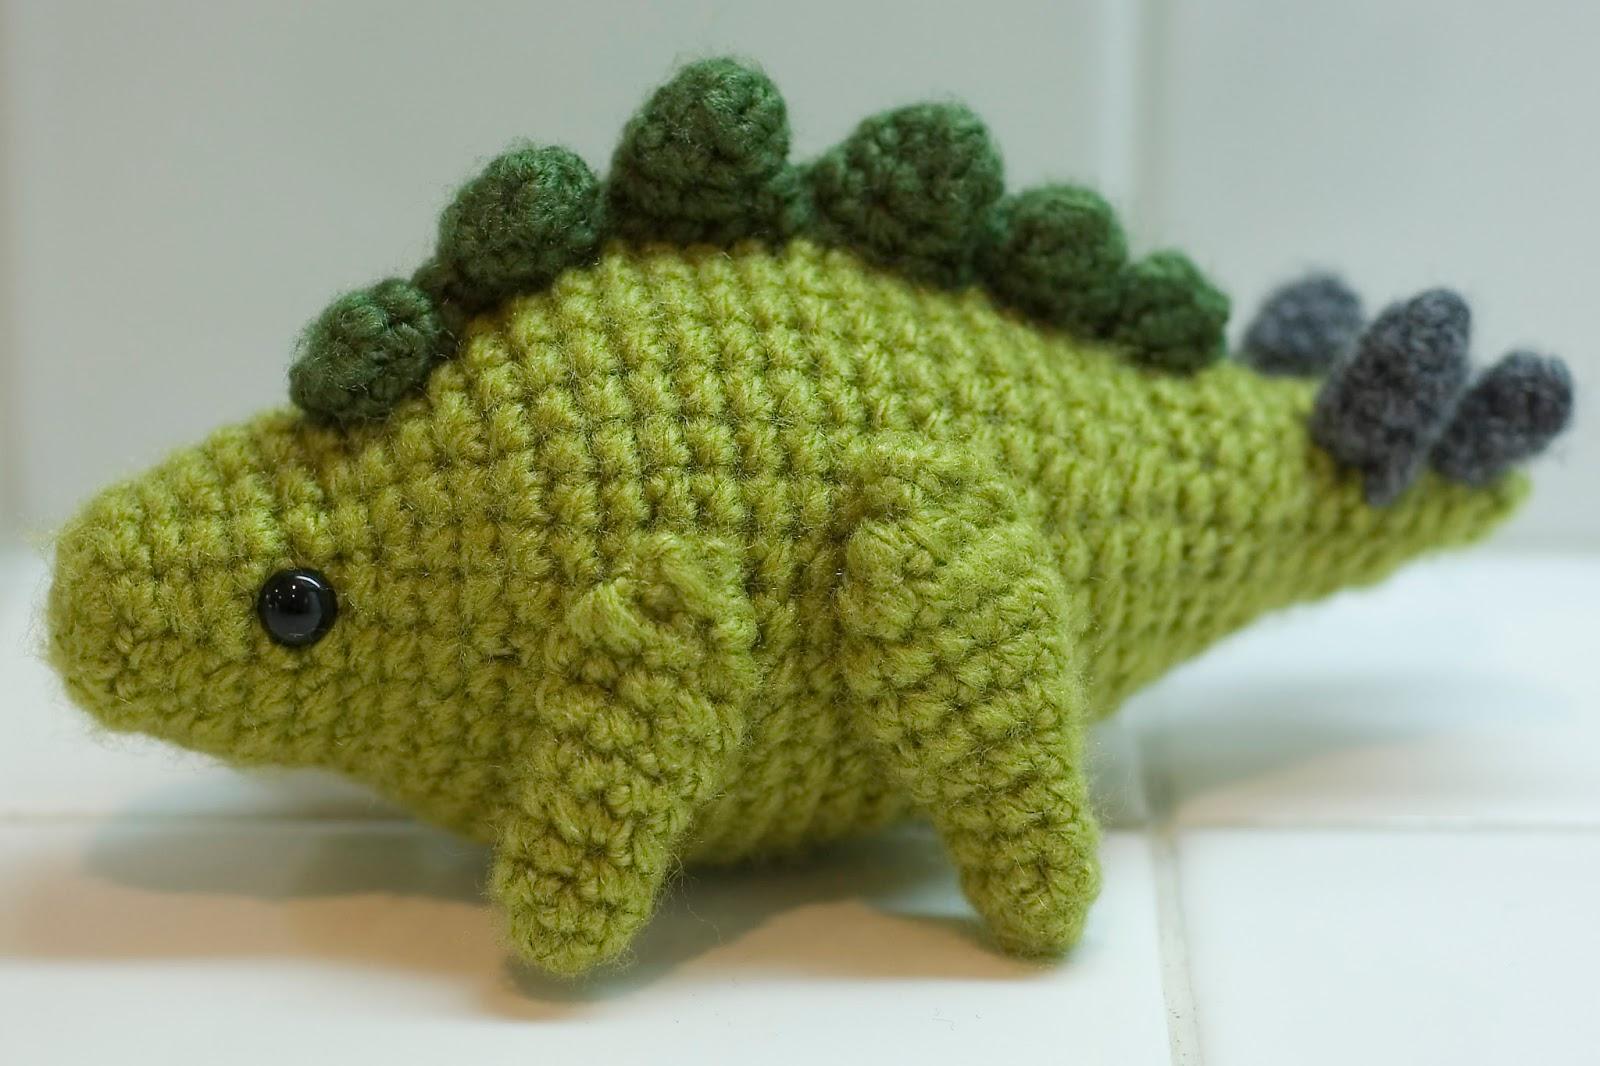 Free Patterns by H: Stegosaurus Amigurumi